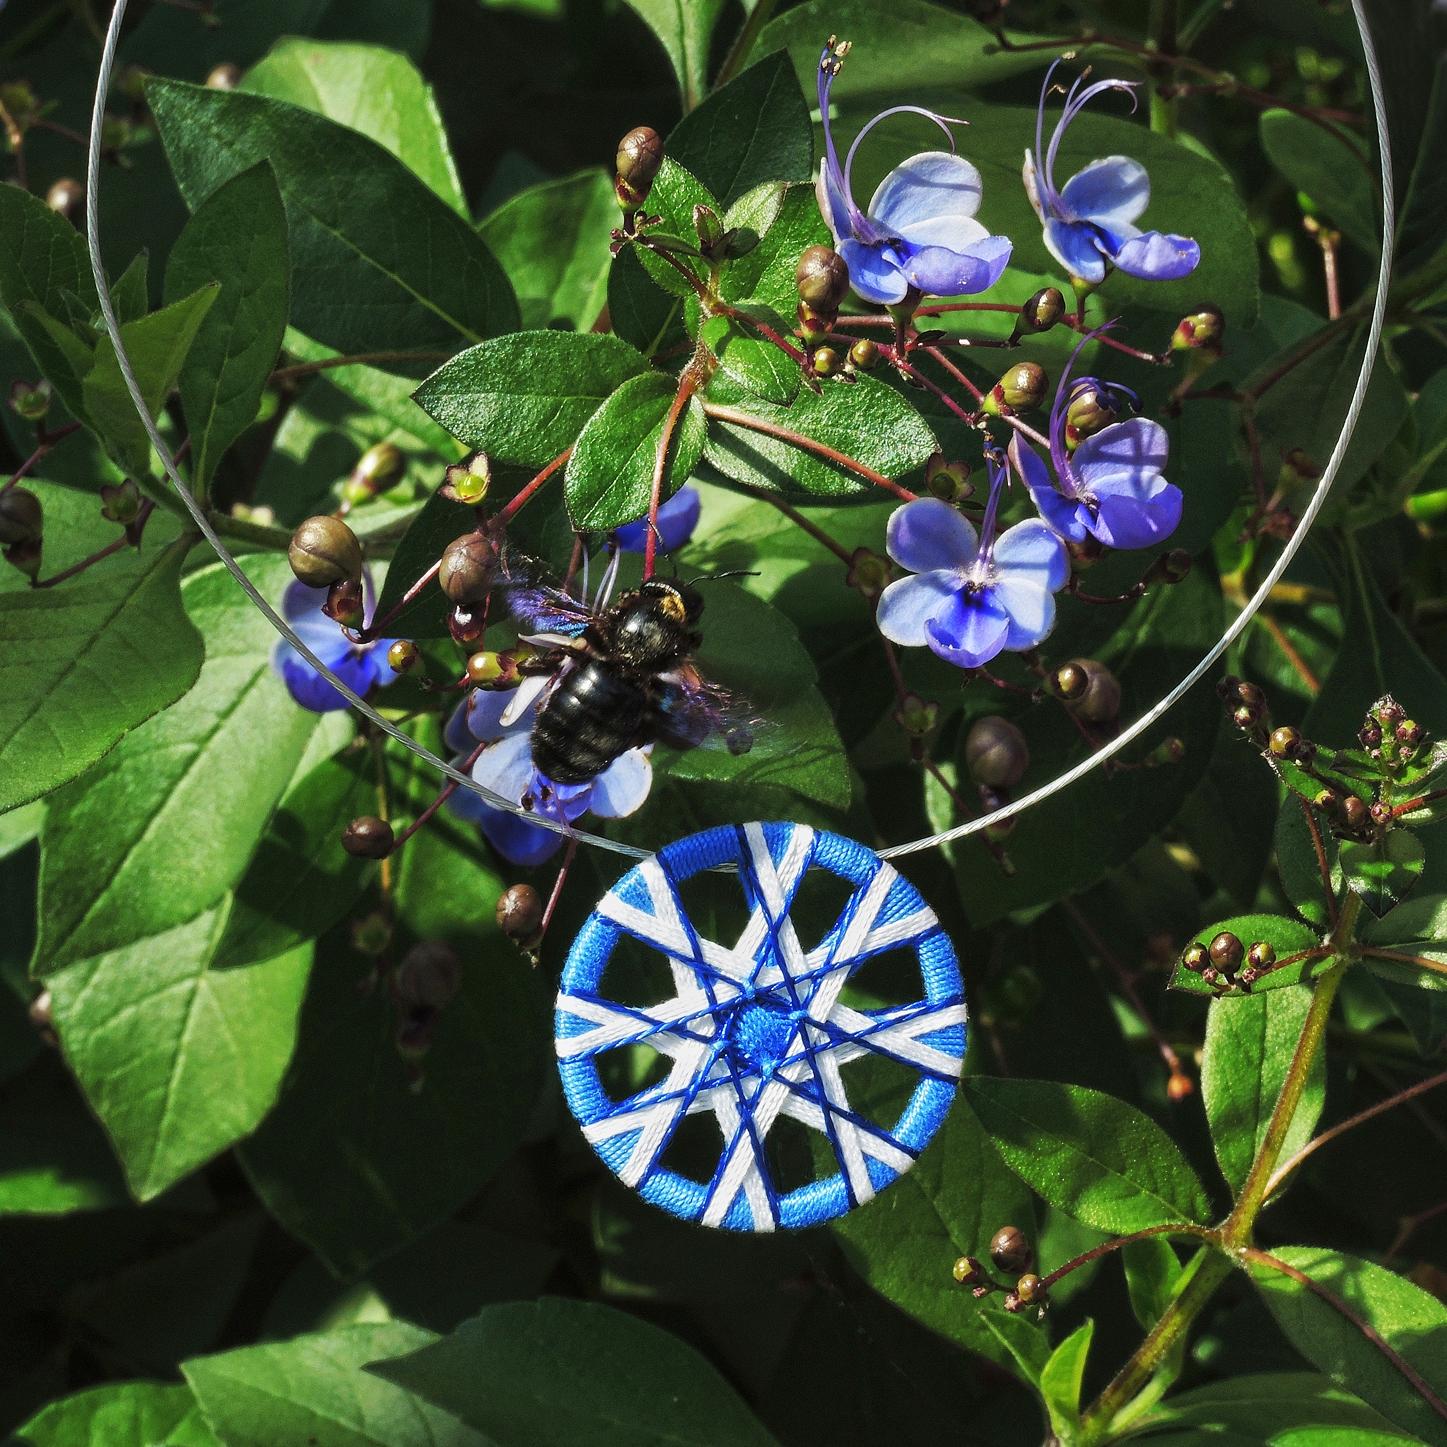 Nr. 51  Zwirnknopf-Anhänger | Ø 44 mm | Material: Baumwolle, Aluminium